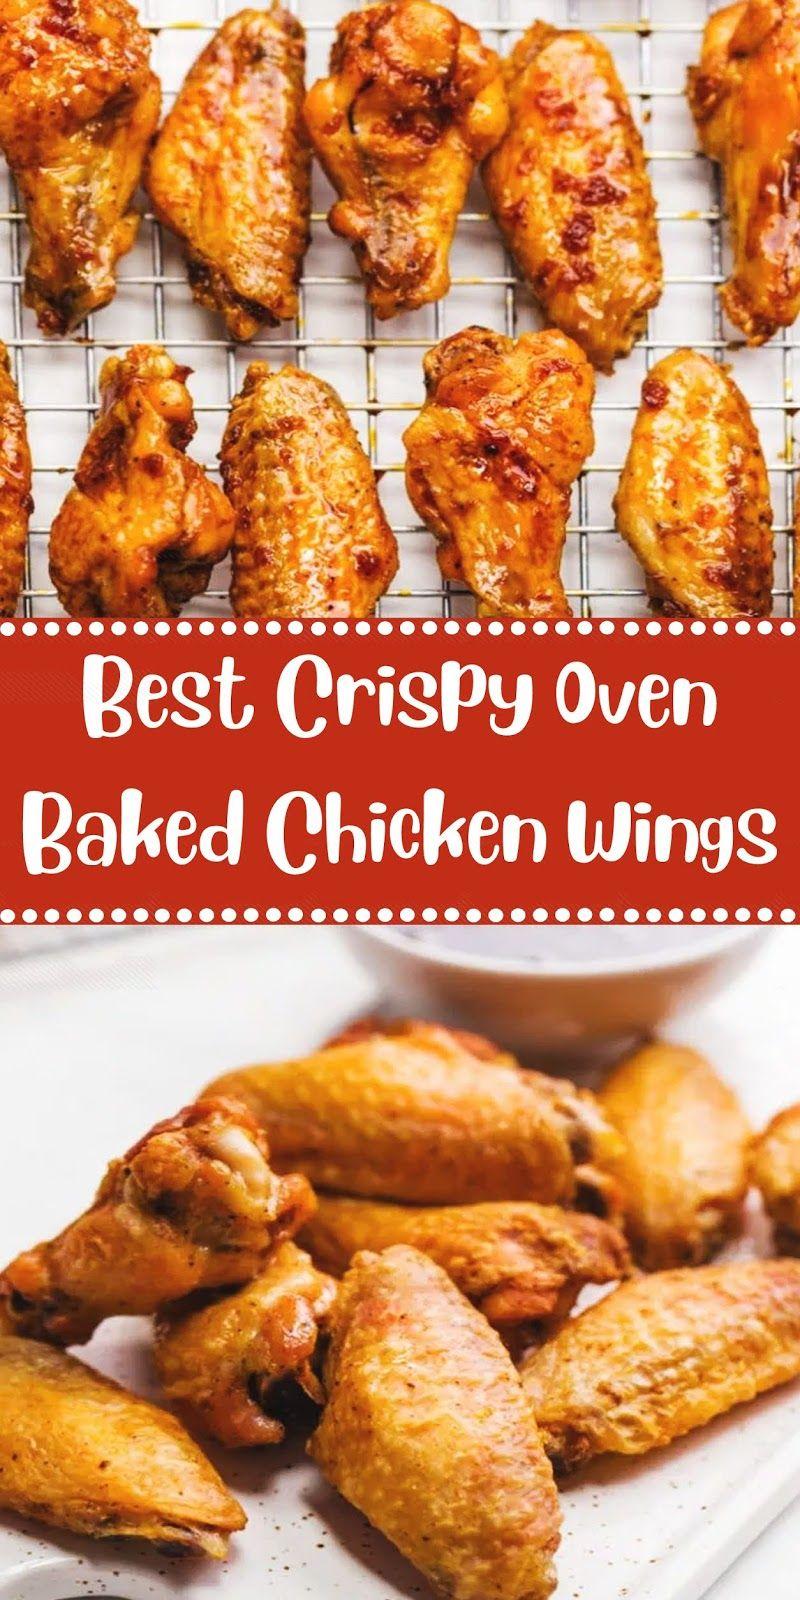 Best Crispy Oven Baked Chicken Wings In 2020 Baked Chicken Wings Baked Chicken Wings Oven Chicken Wings